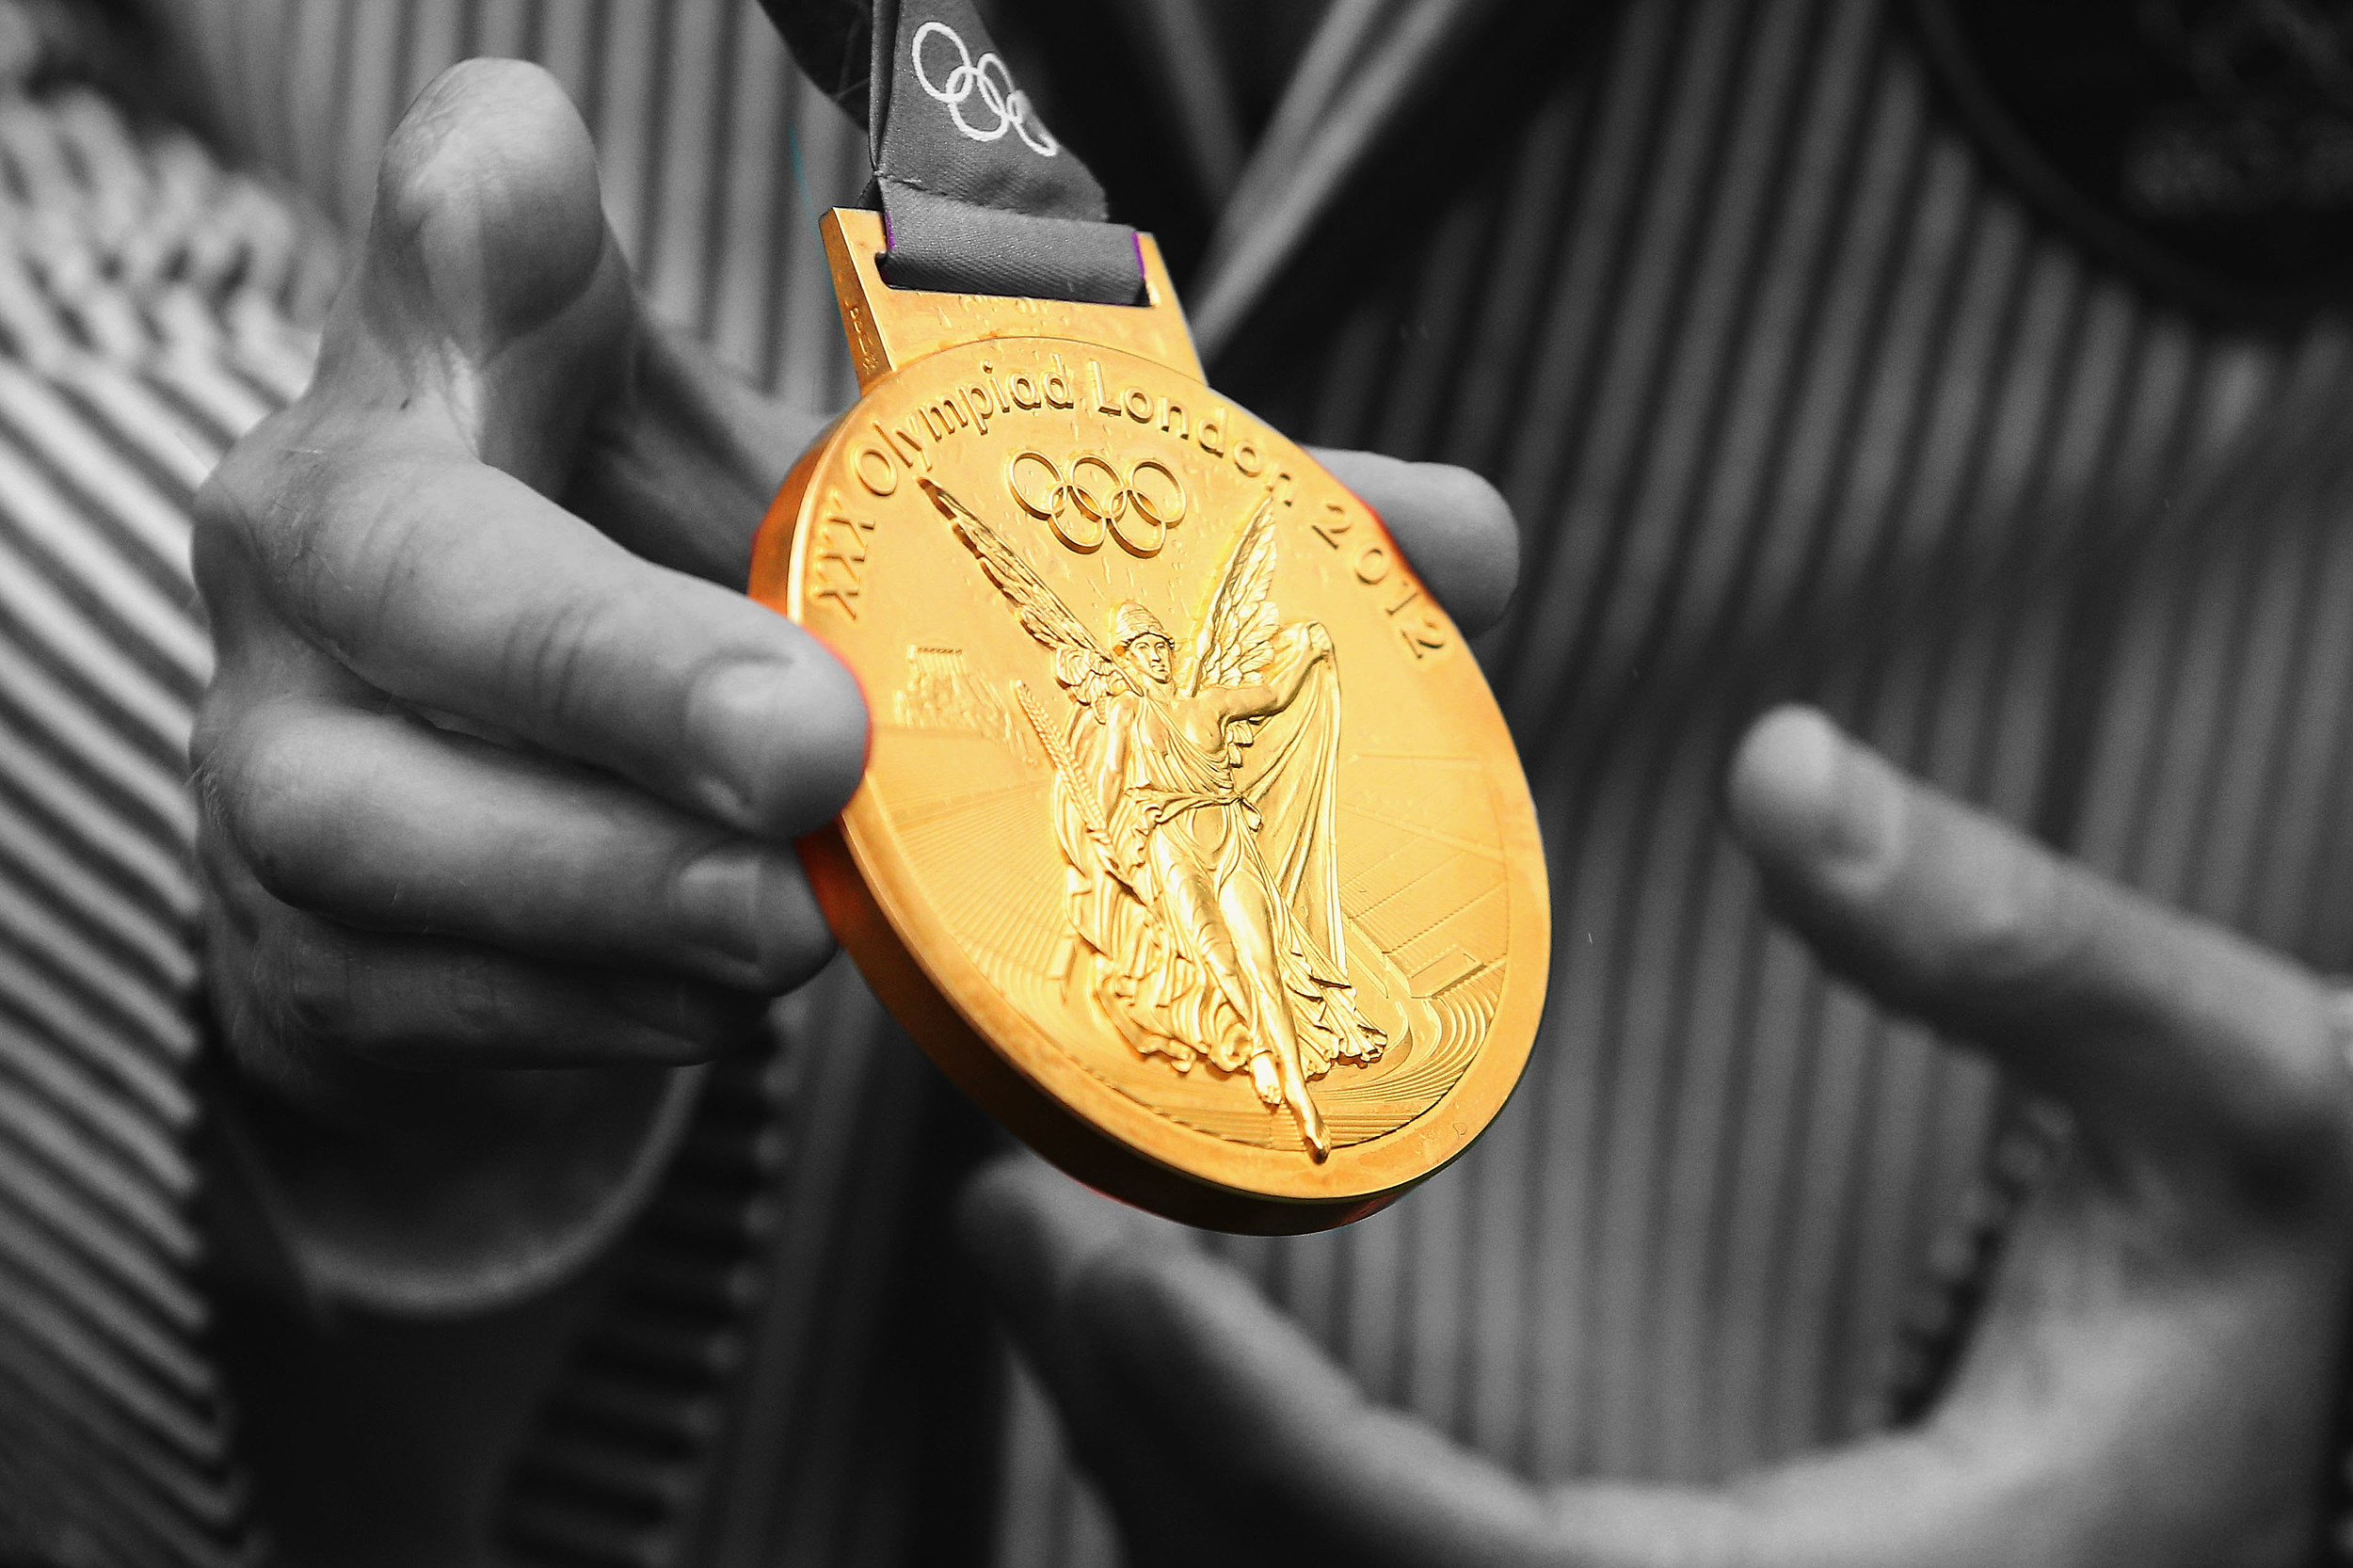 Contest to win money 2018 olympics